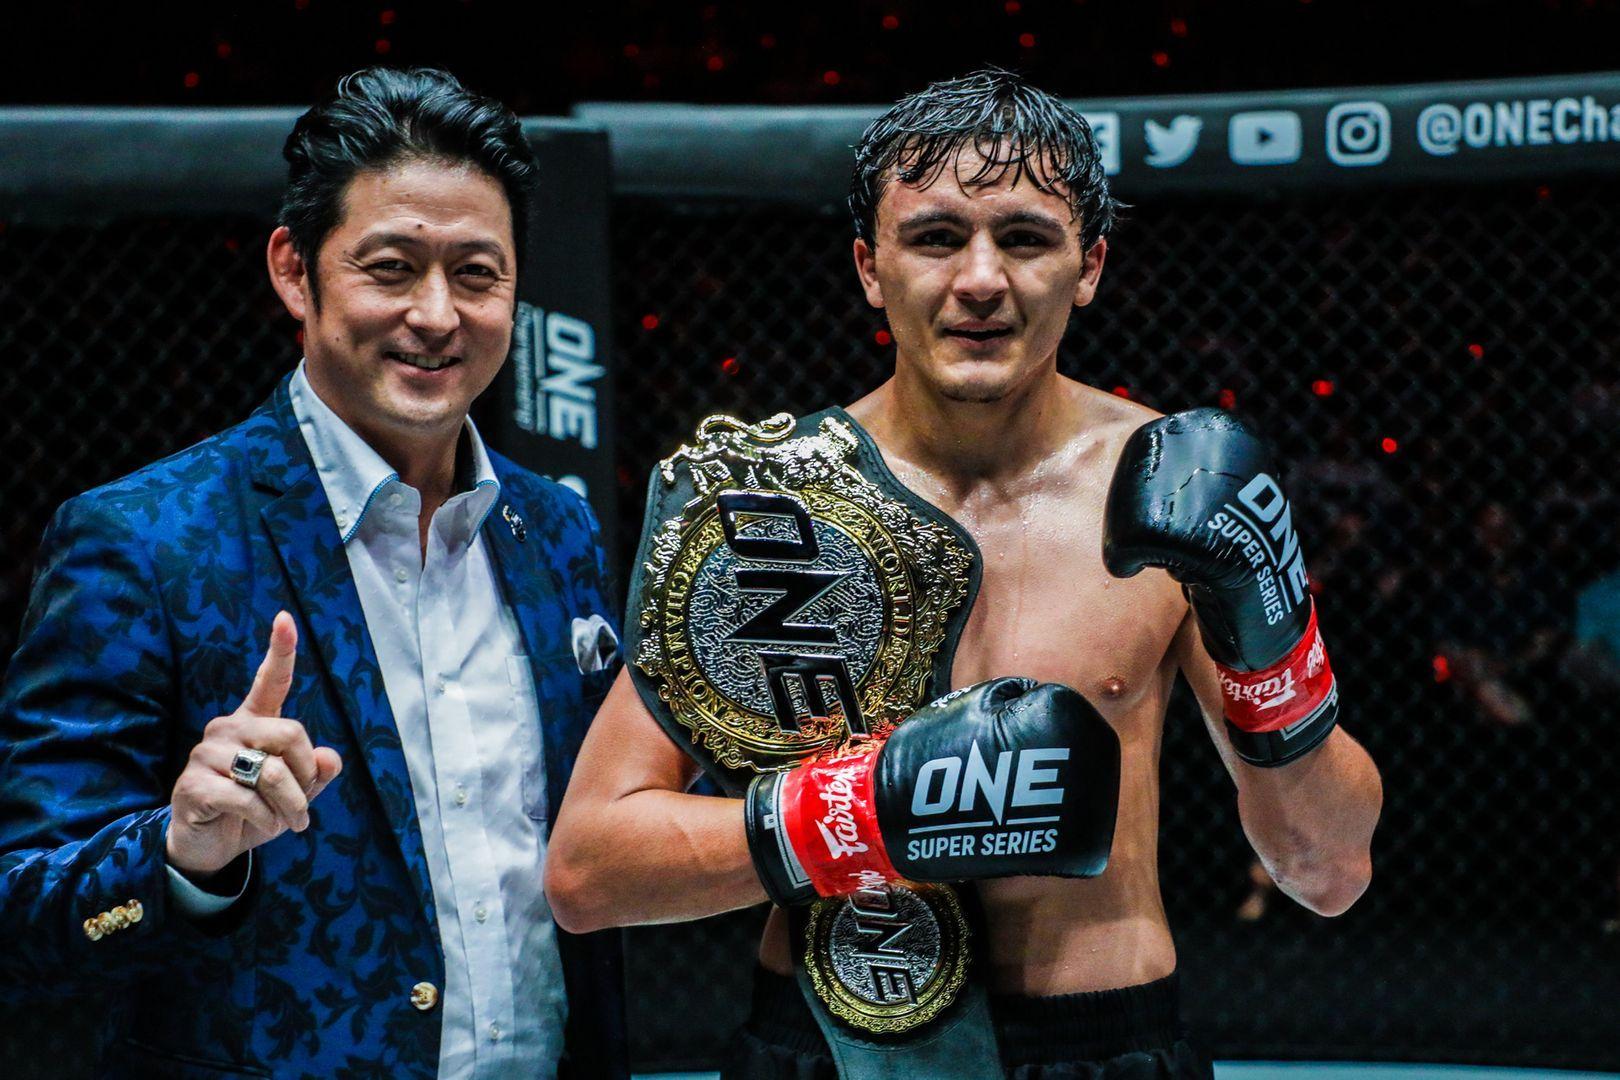 ONE Bantamweight Kickboxing World Champion Alaverdi Ramazanov